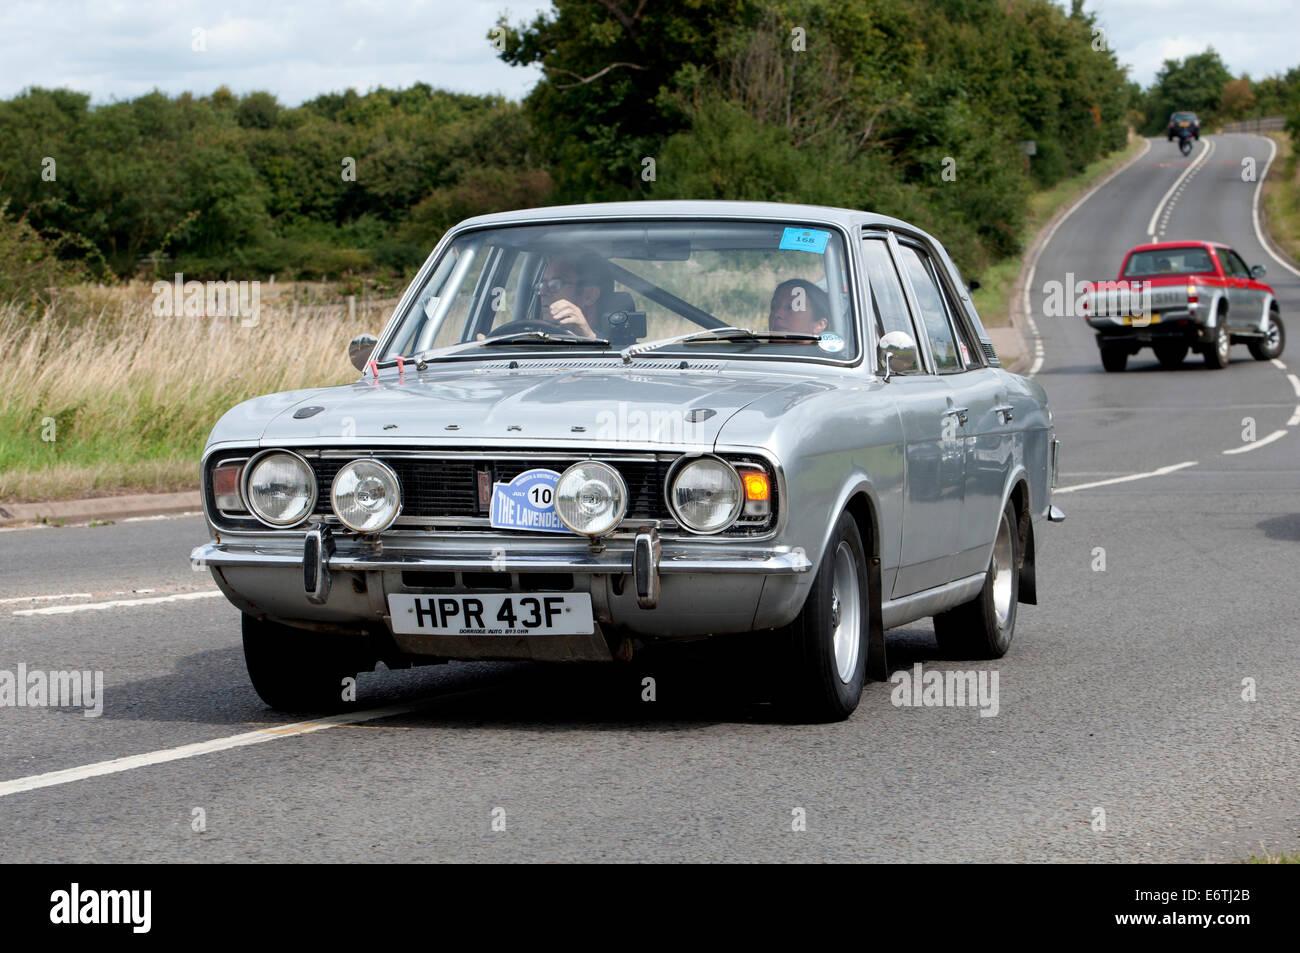 Ford Cortina car on the Fosse Way road, Warwickshire, UK - Stock Image